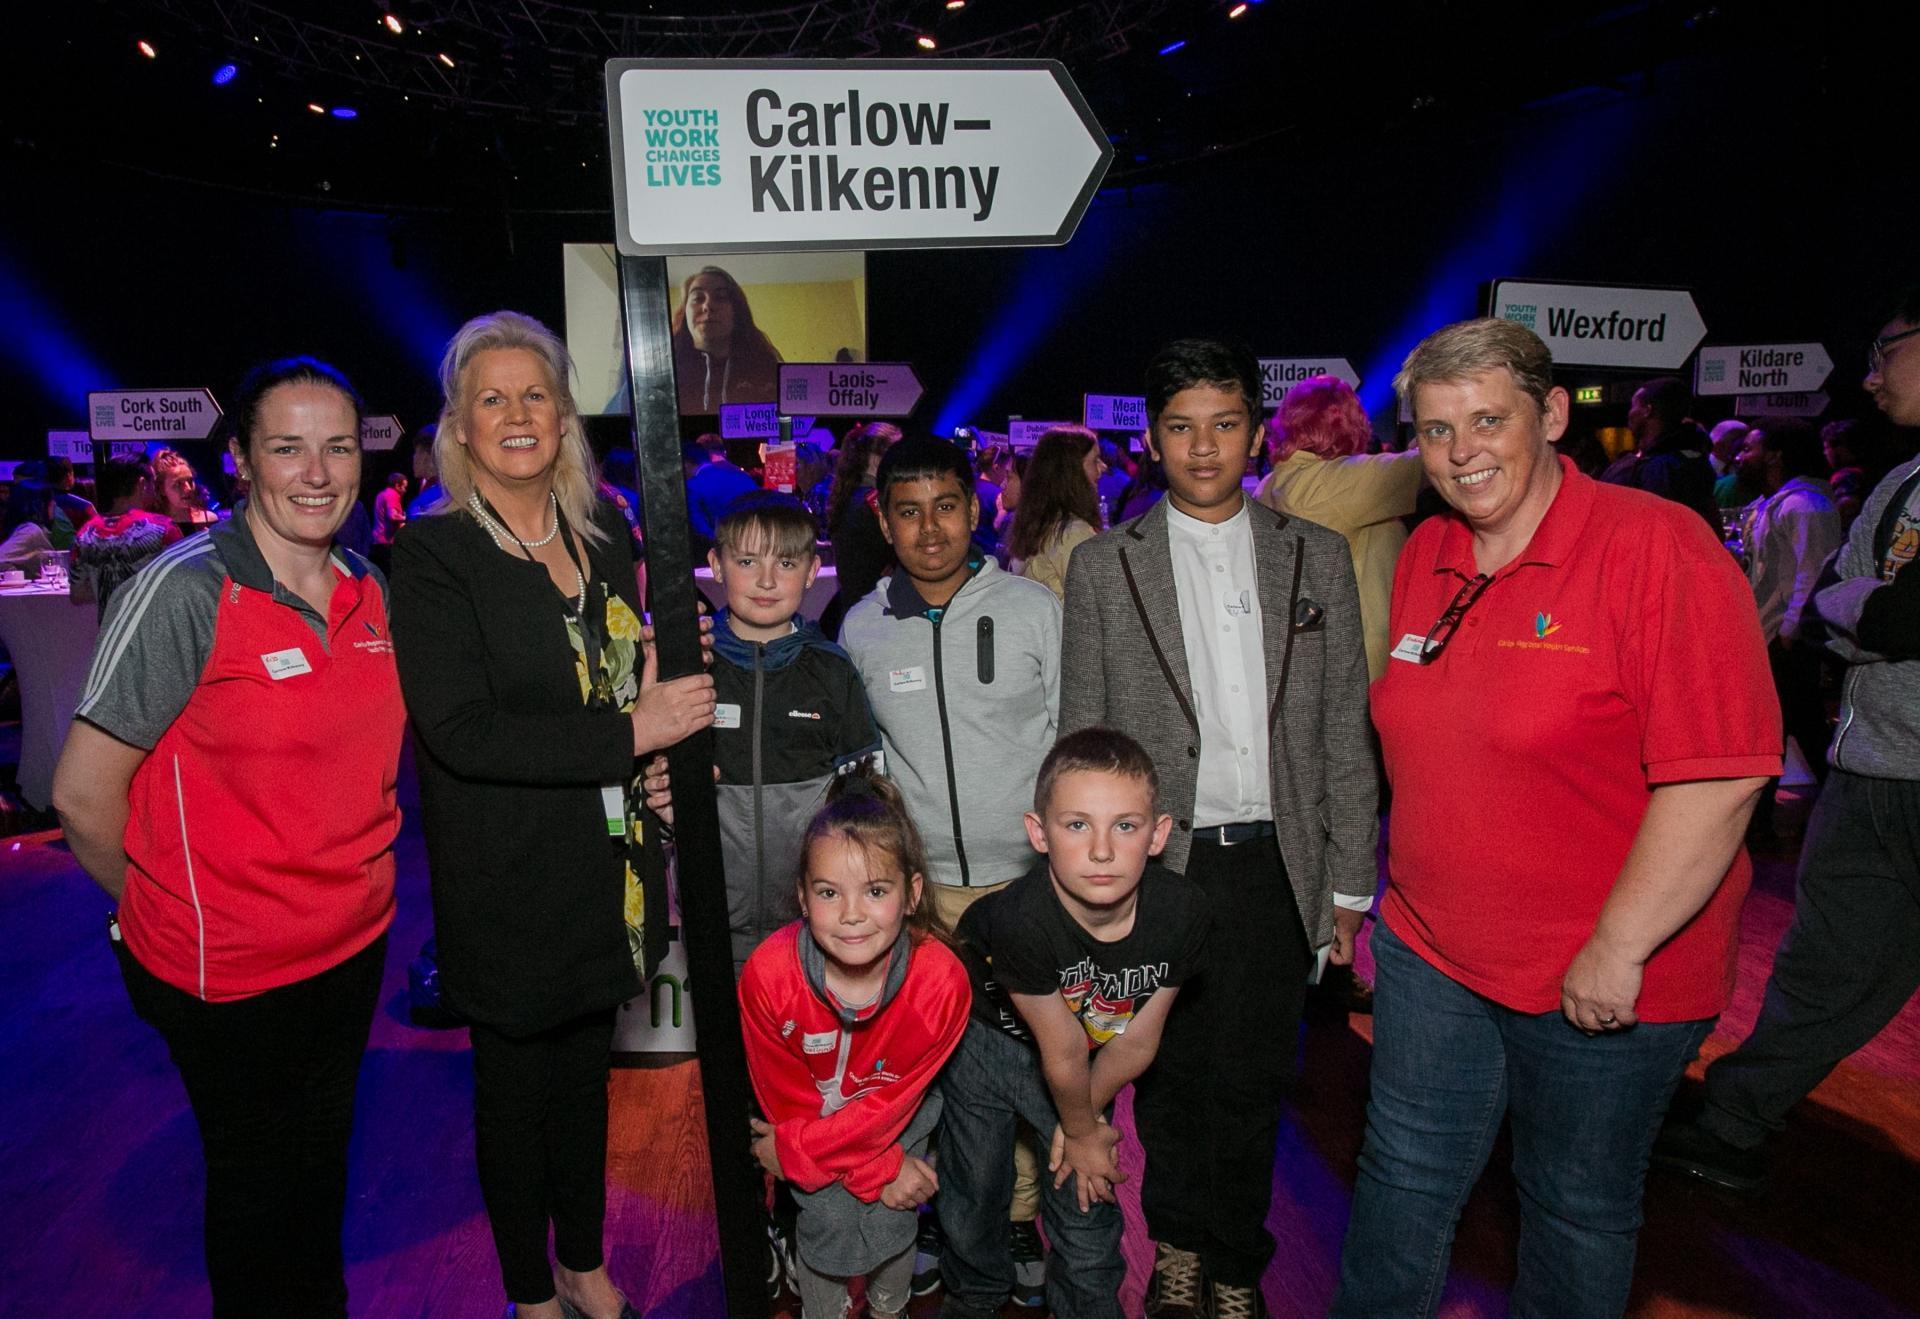 Carlow, Ireland Party Events   Eventbrite